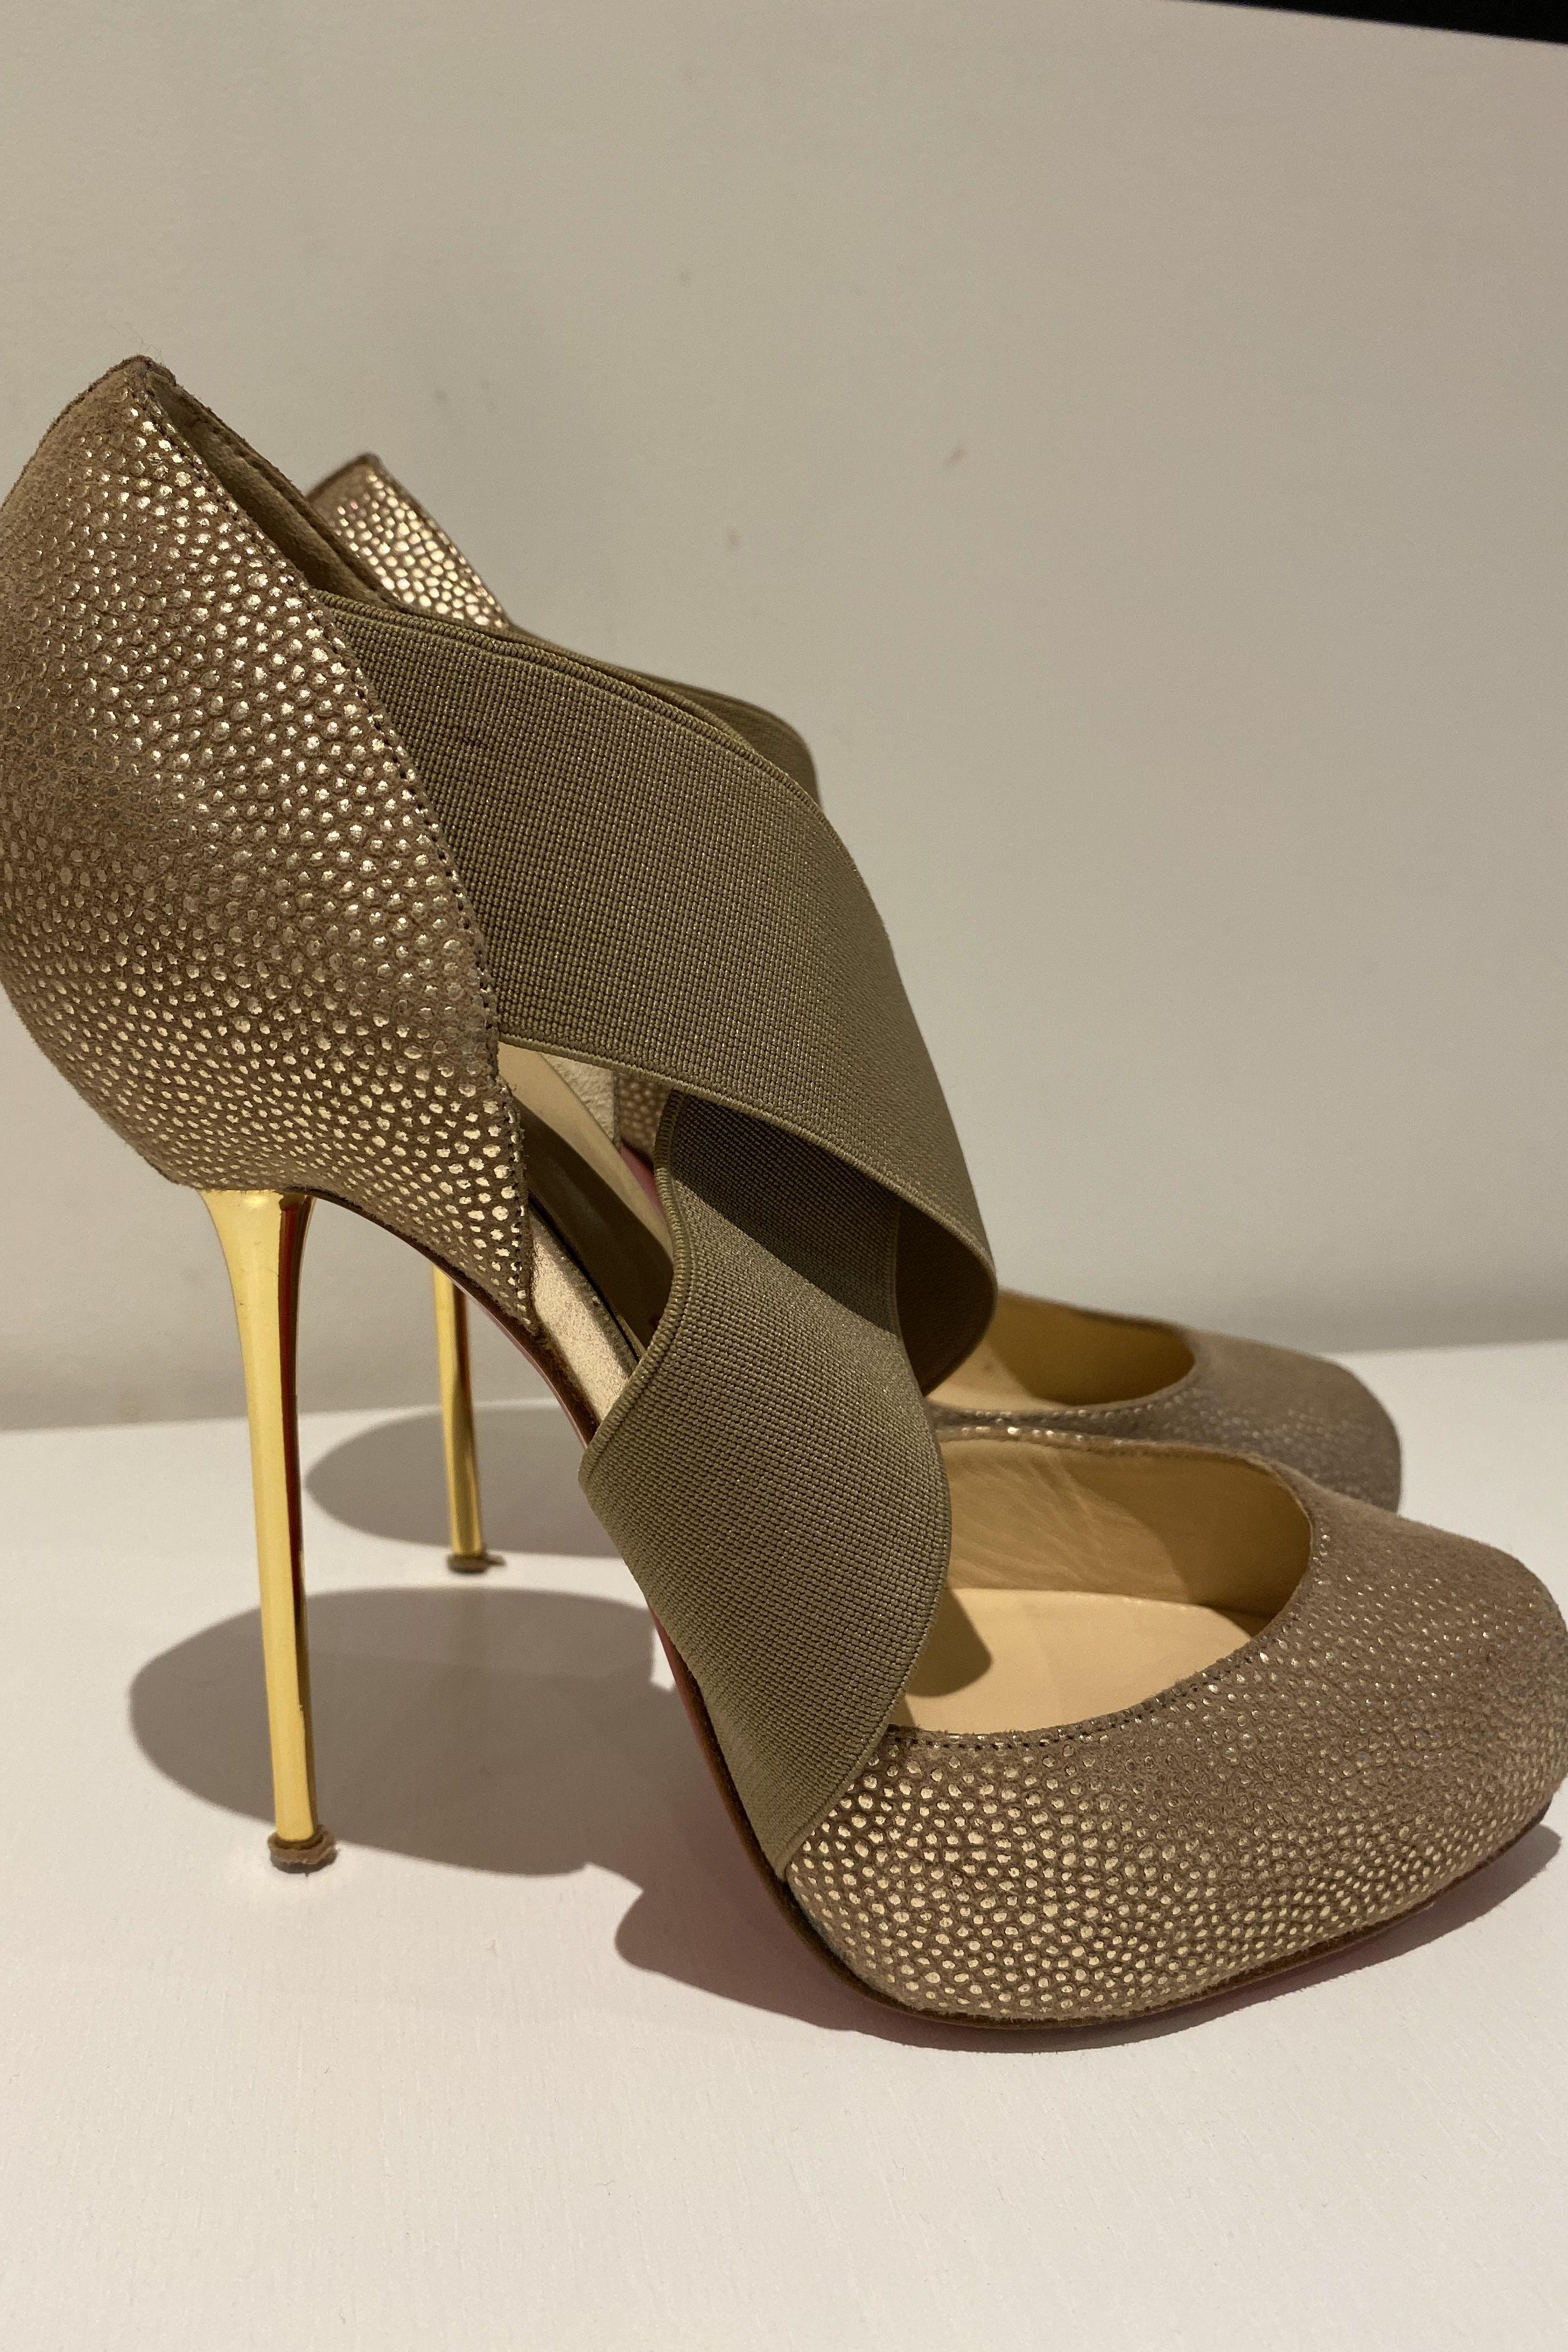 Christian Louboutin Big Dorcet 120 Gold Heels 5 Preview Images